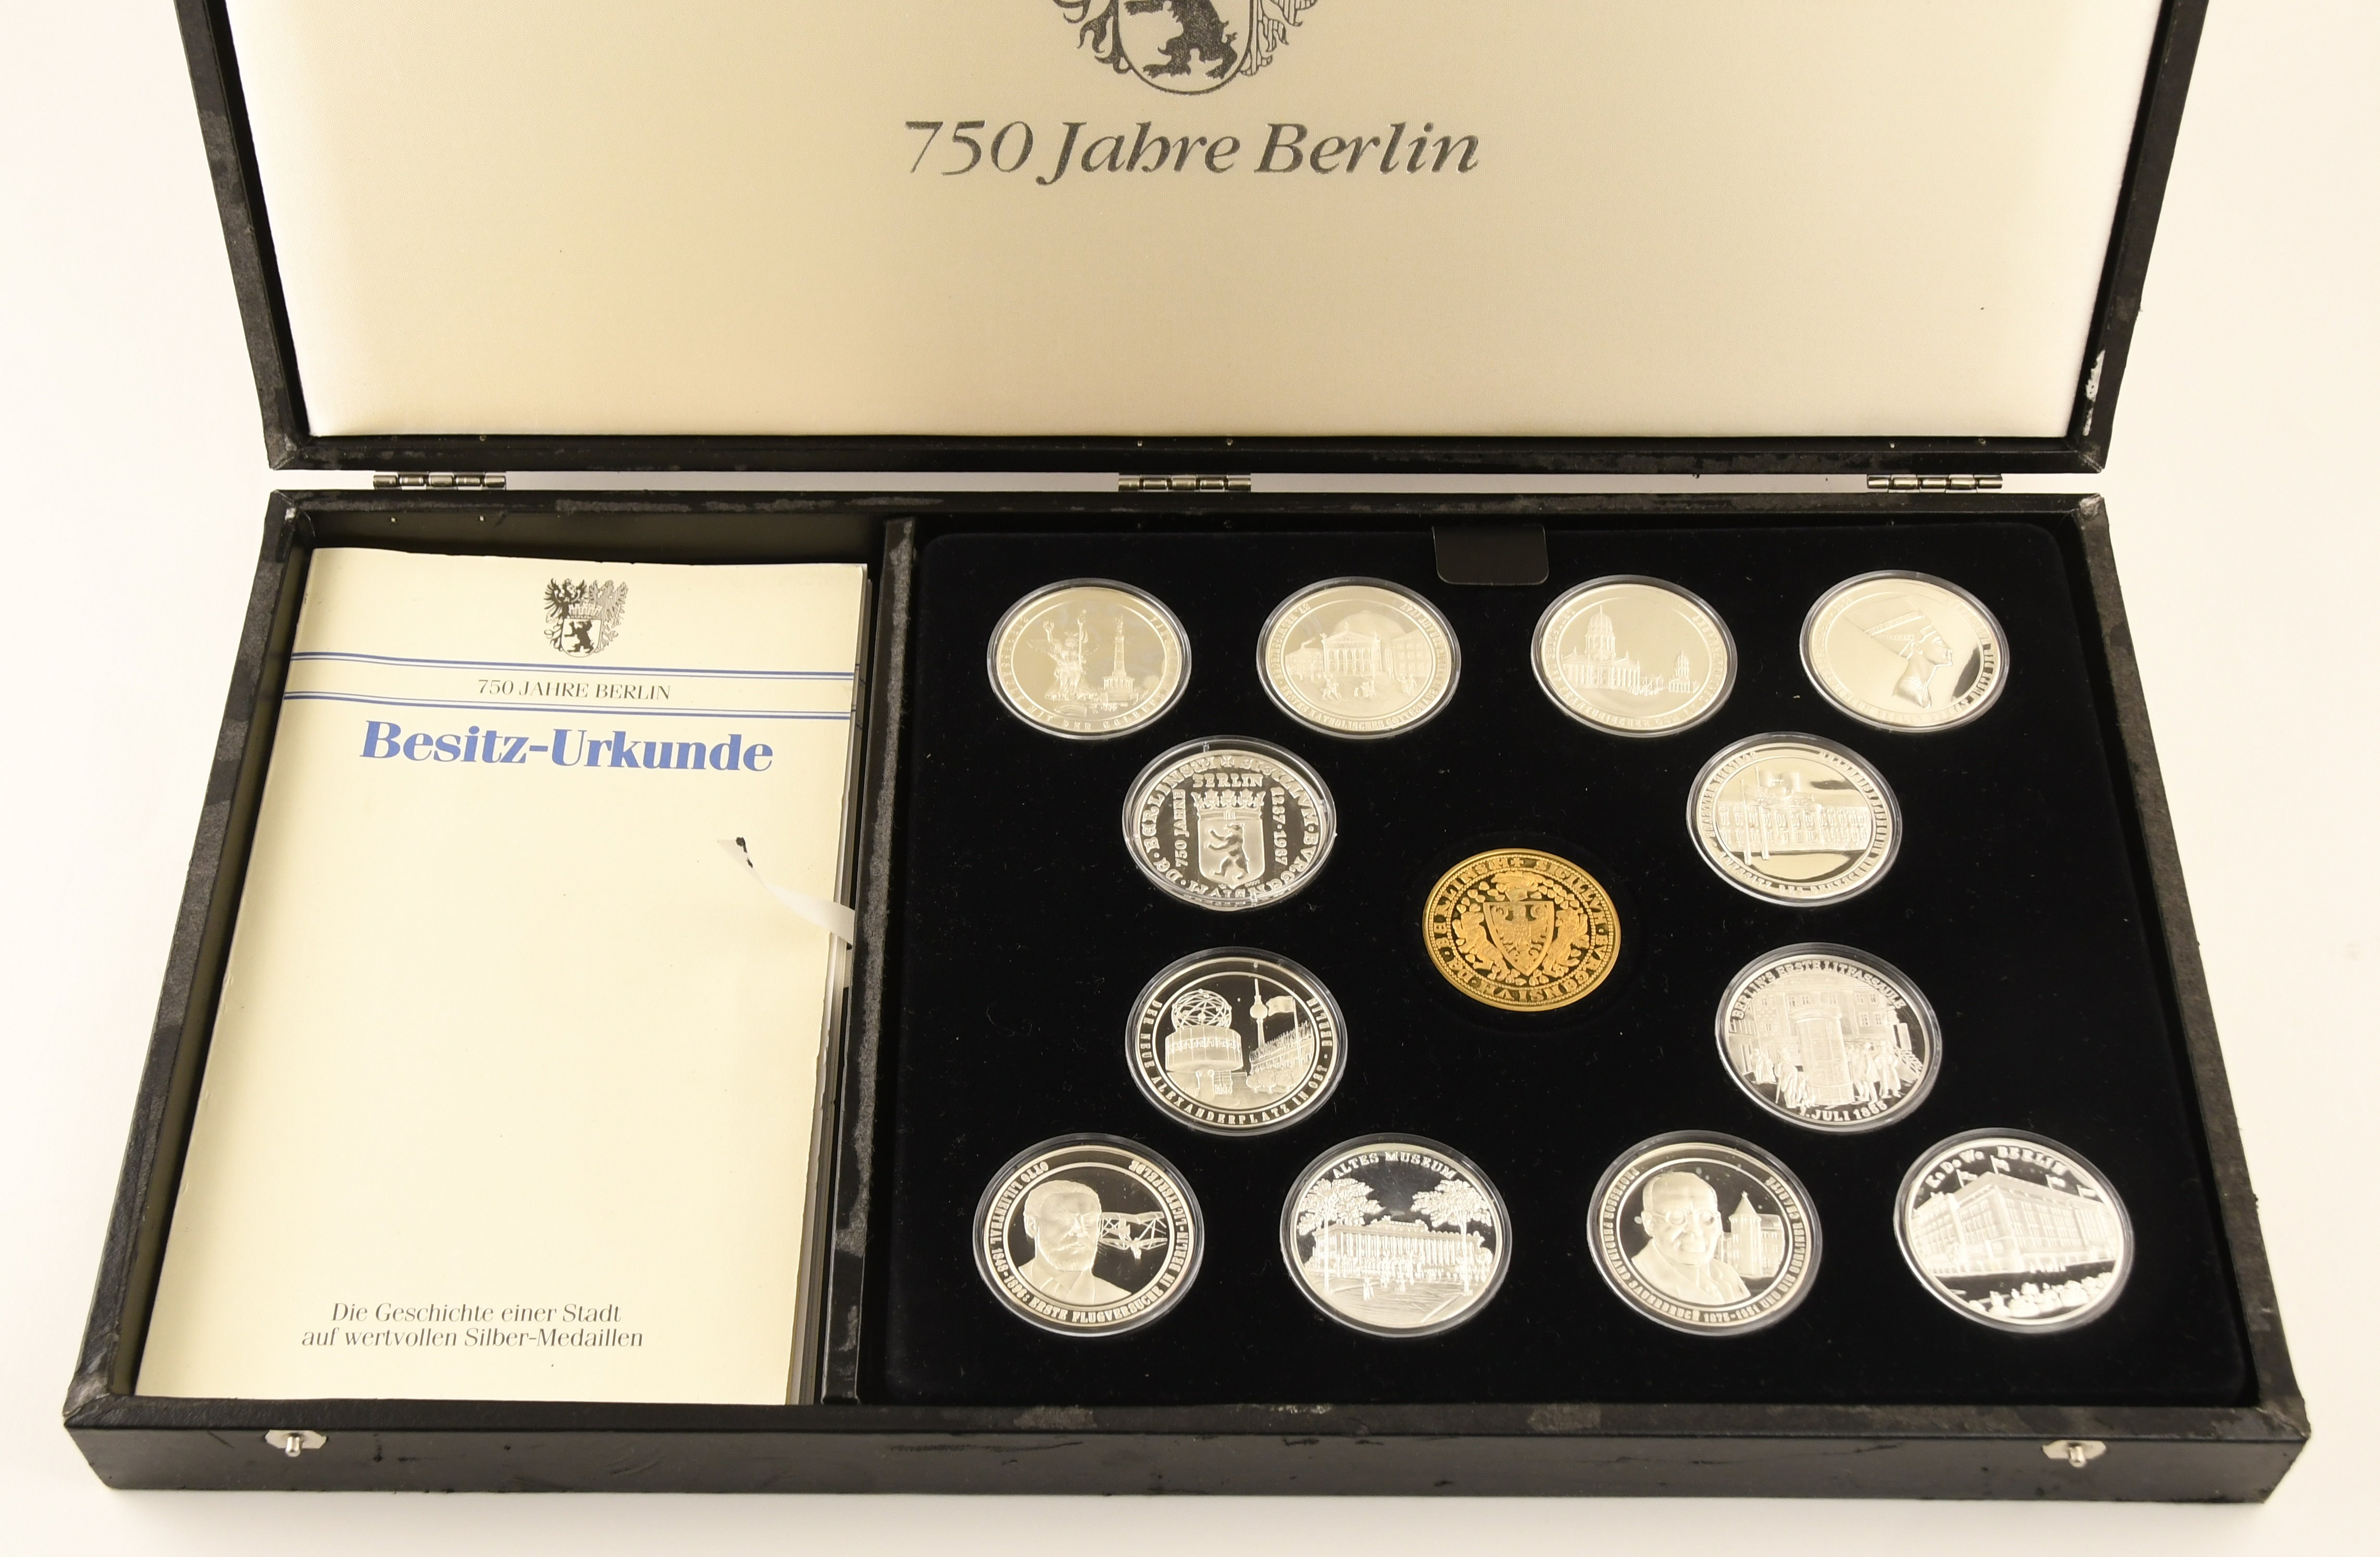 Lot 2668 - Sammlungen Medaillen 750 Jahre Berlin S -  Auktionshaus Ulrich Felzmann GmbH & Co. KG Auction 169